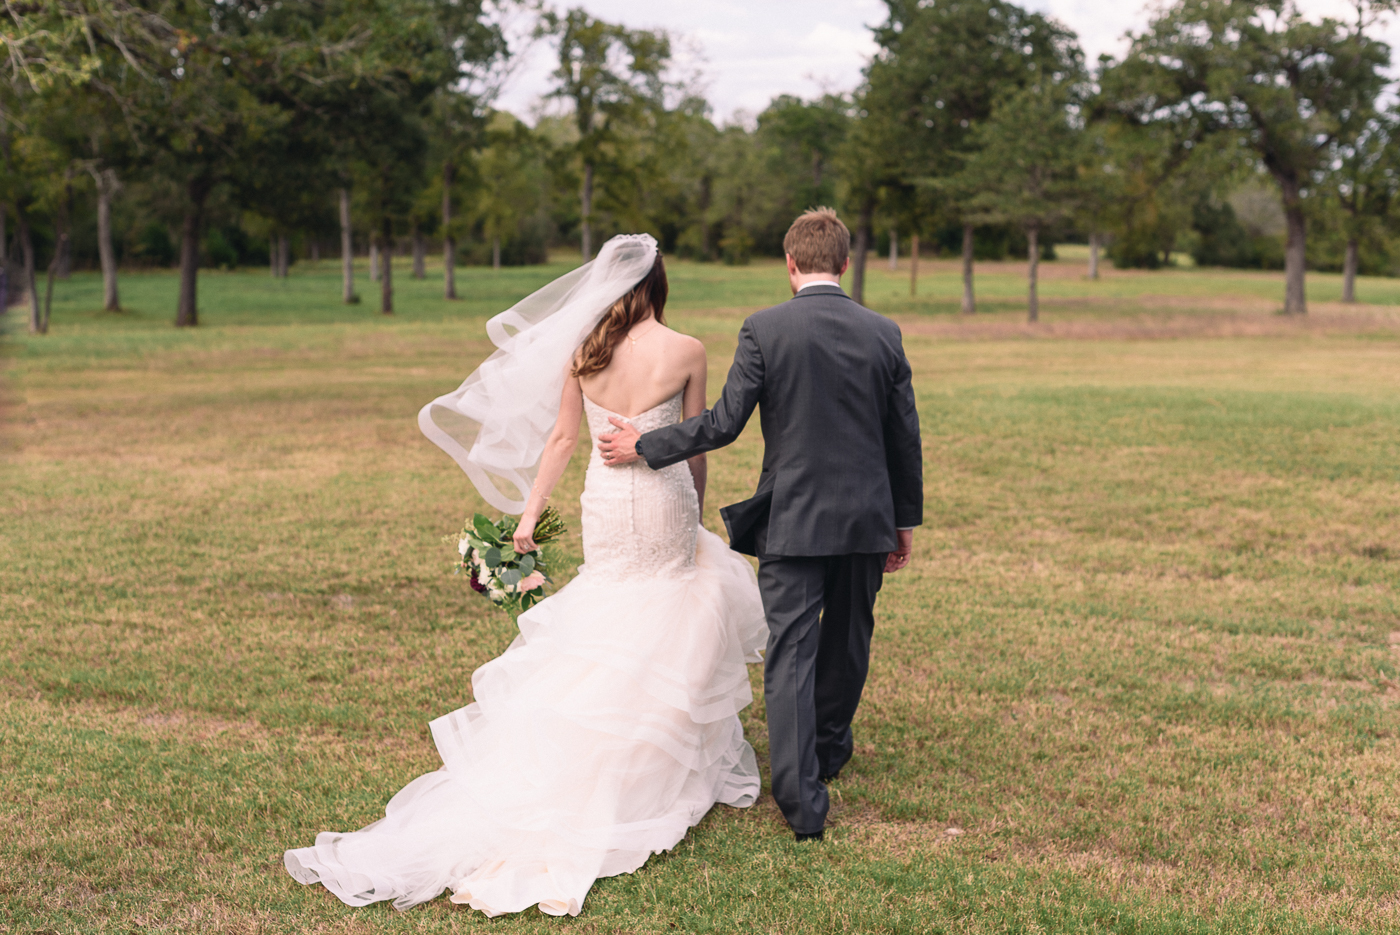 husband and wife wedding portrait candid shot veil wedding bouquet